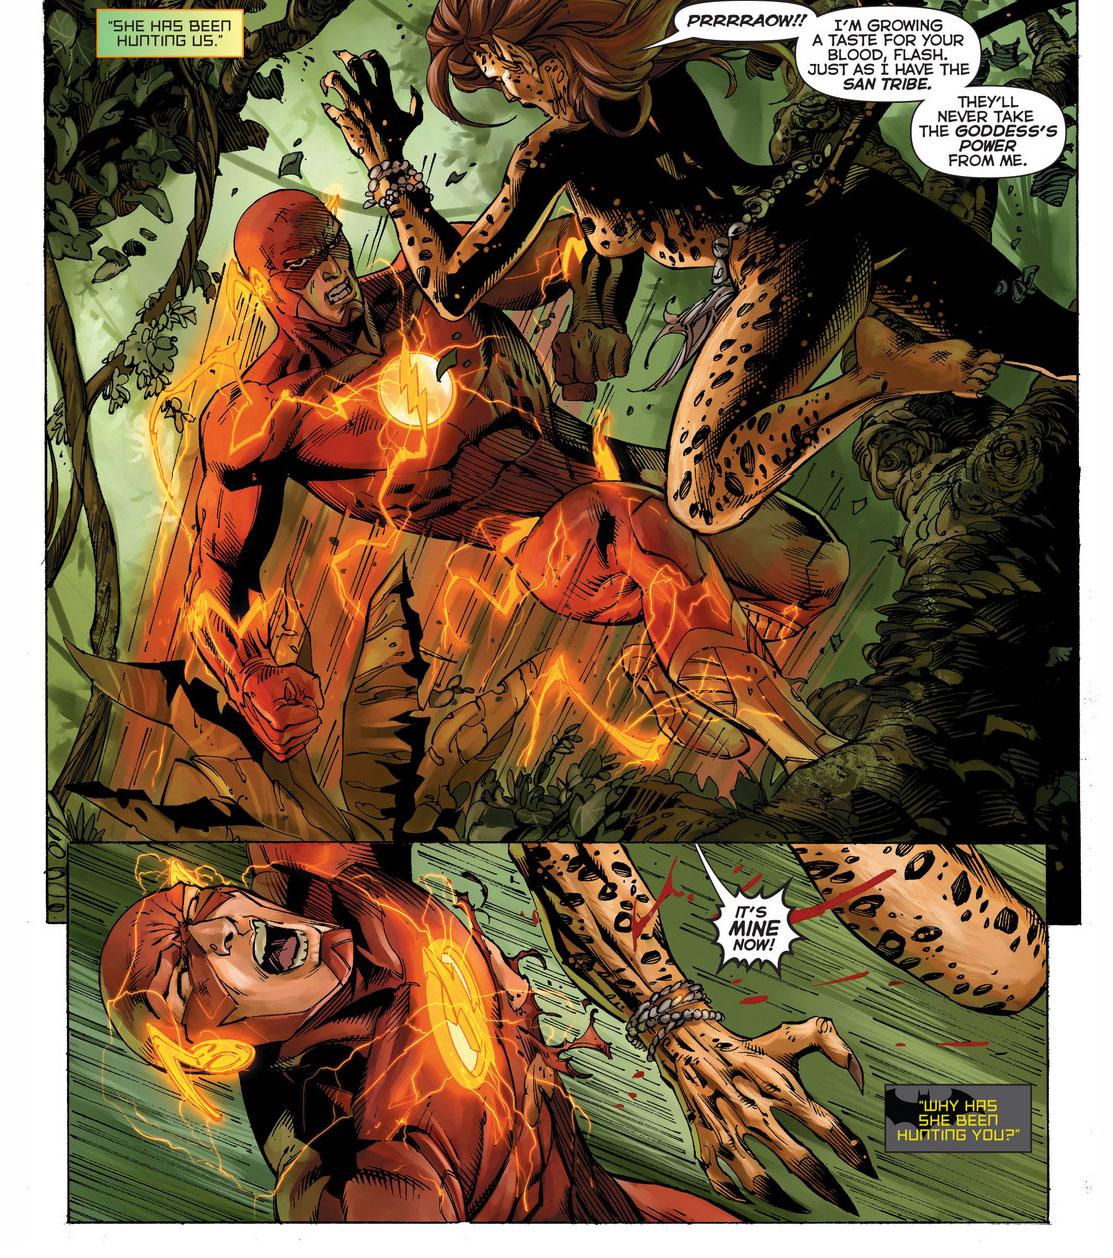 The flash wonder woman and aquaman vs the cheetah comicnewbies